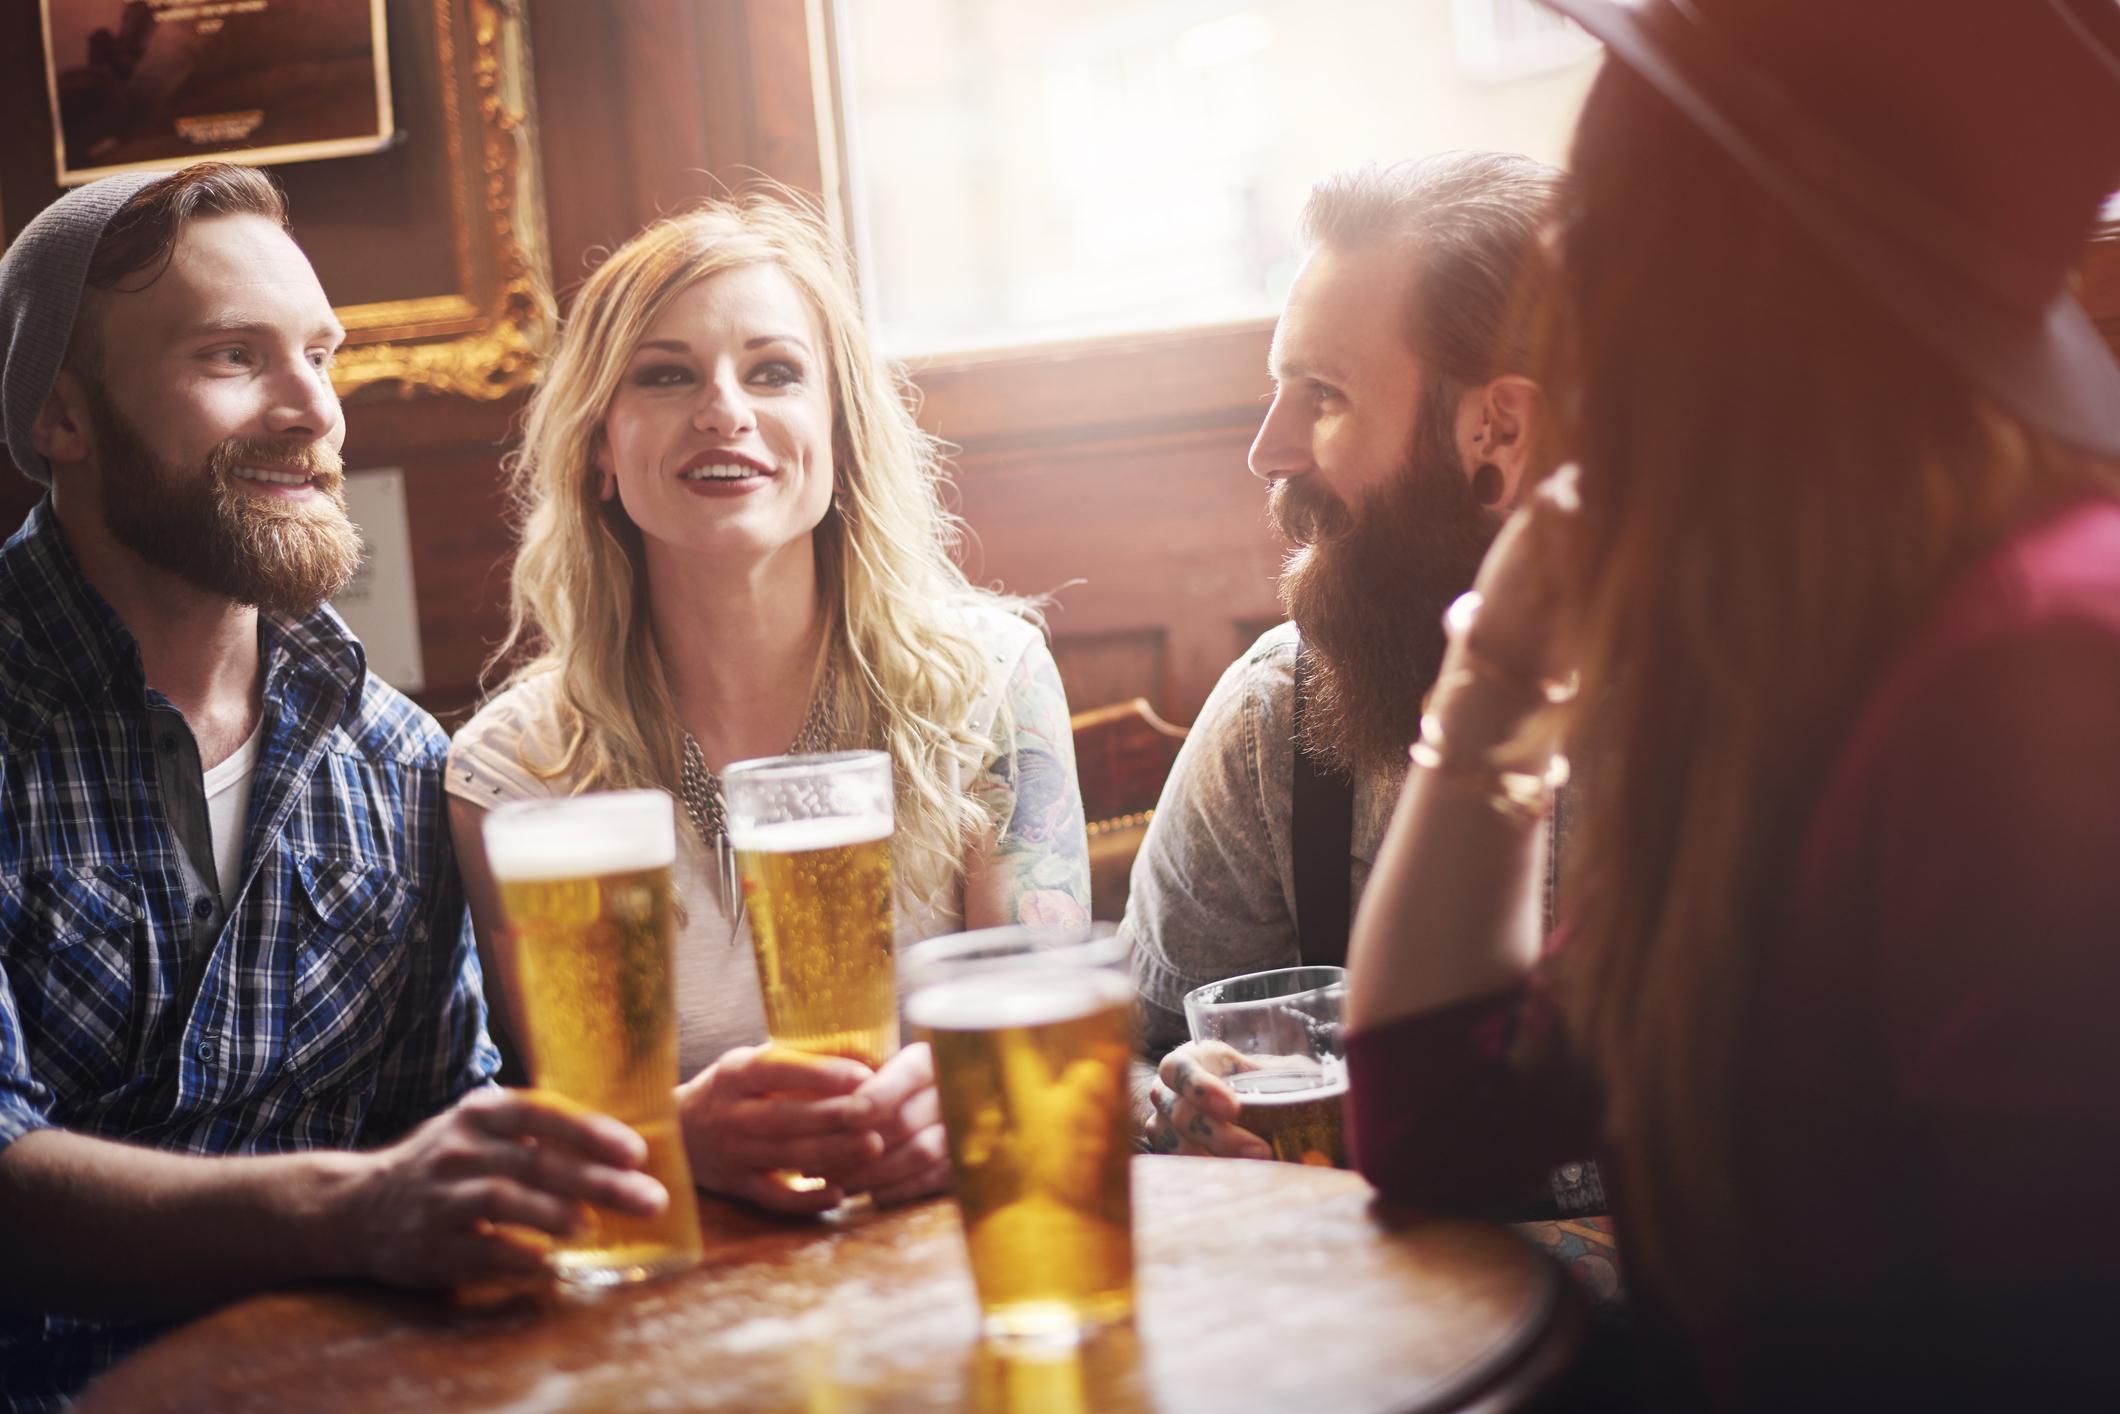 Friends having a beer at a bar.